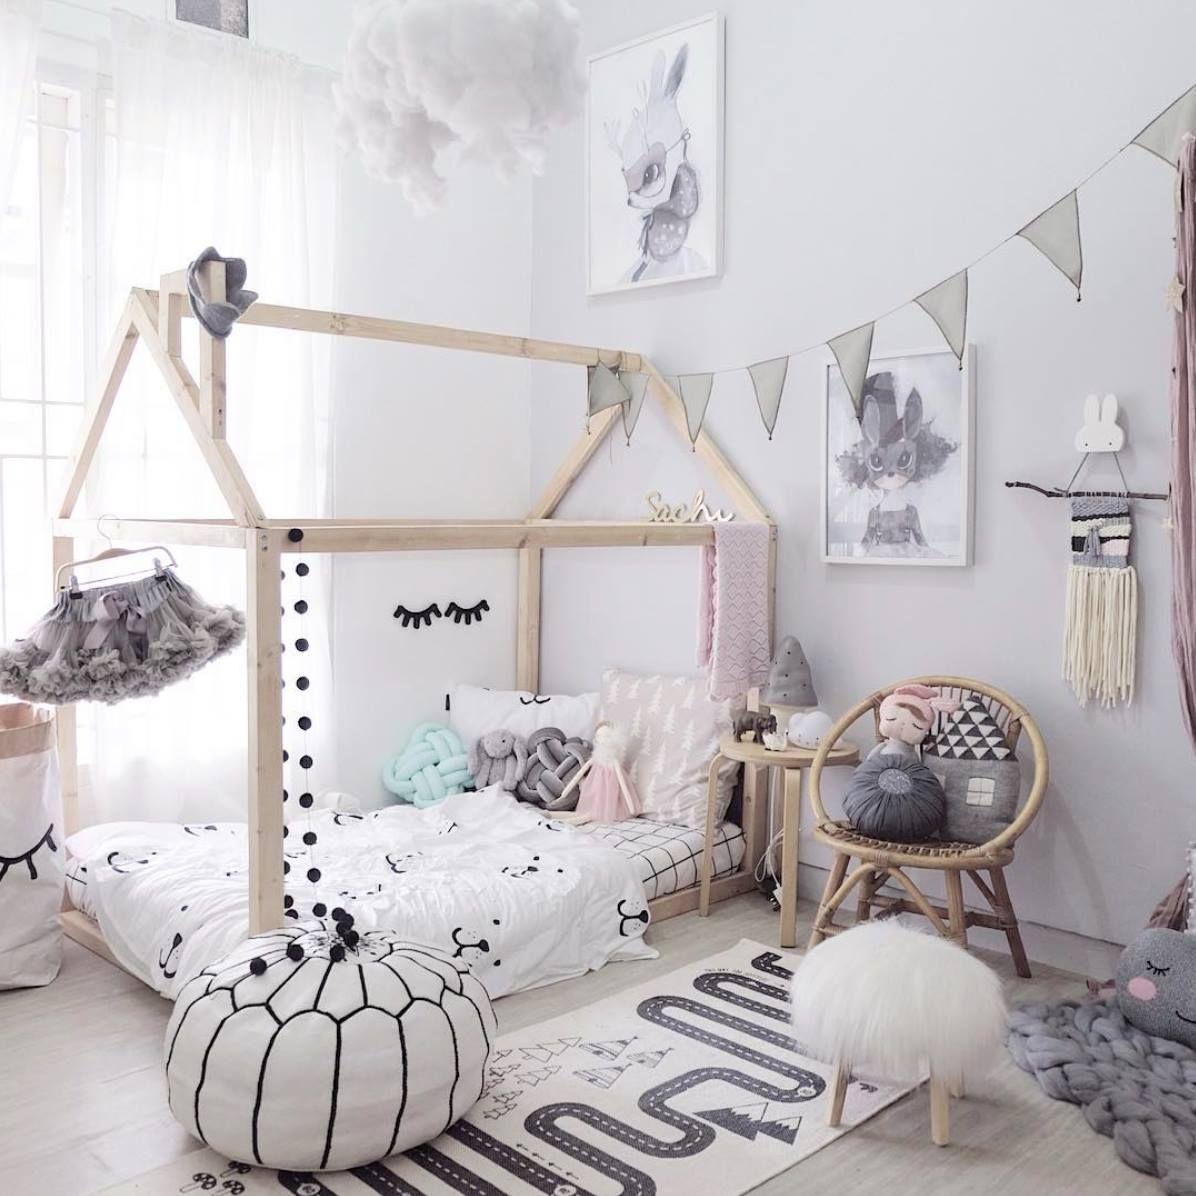 pin van suzanne smit van hattum op olivia kamer pinterest kinderzimmer kinderzimmer ideen. Black Bedroom Furniture Sets. Home Design Ideas